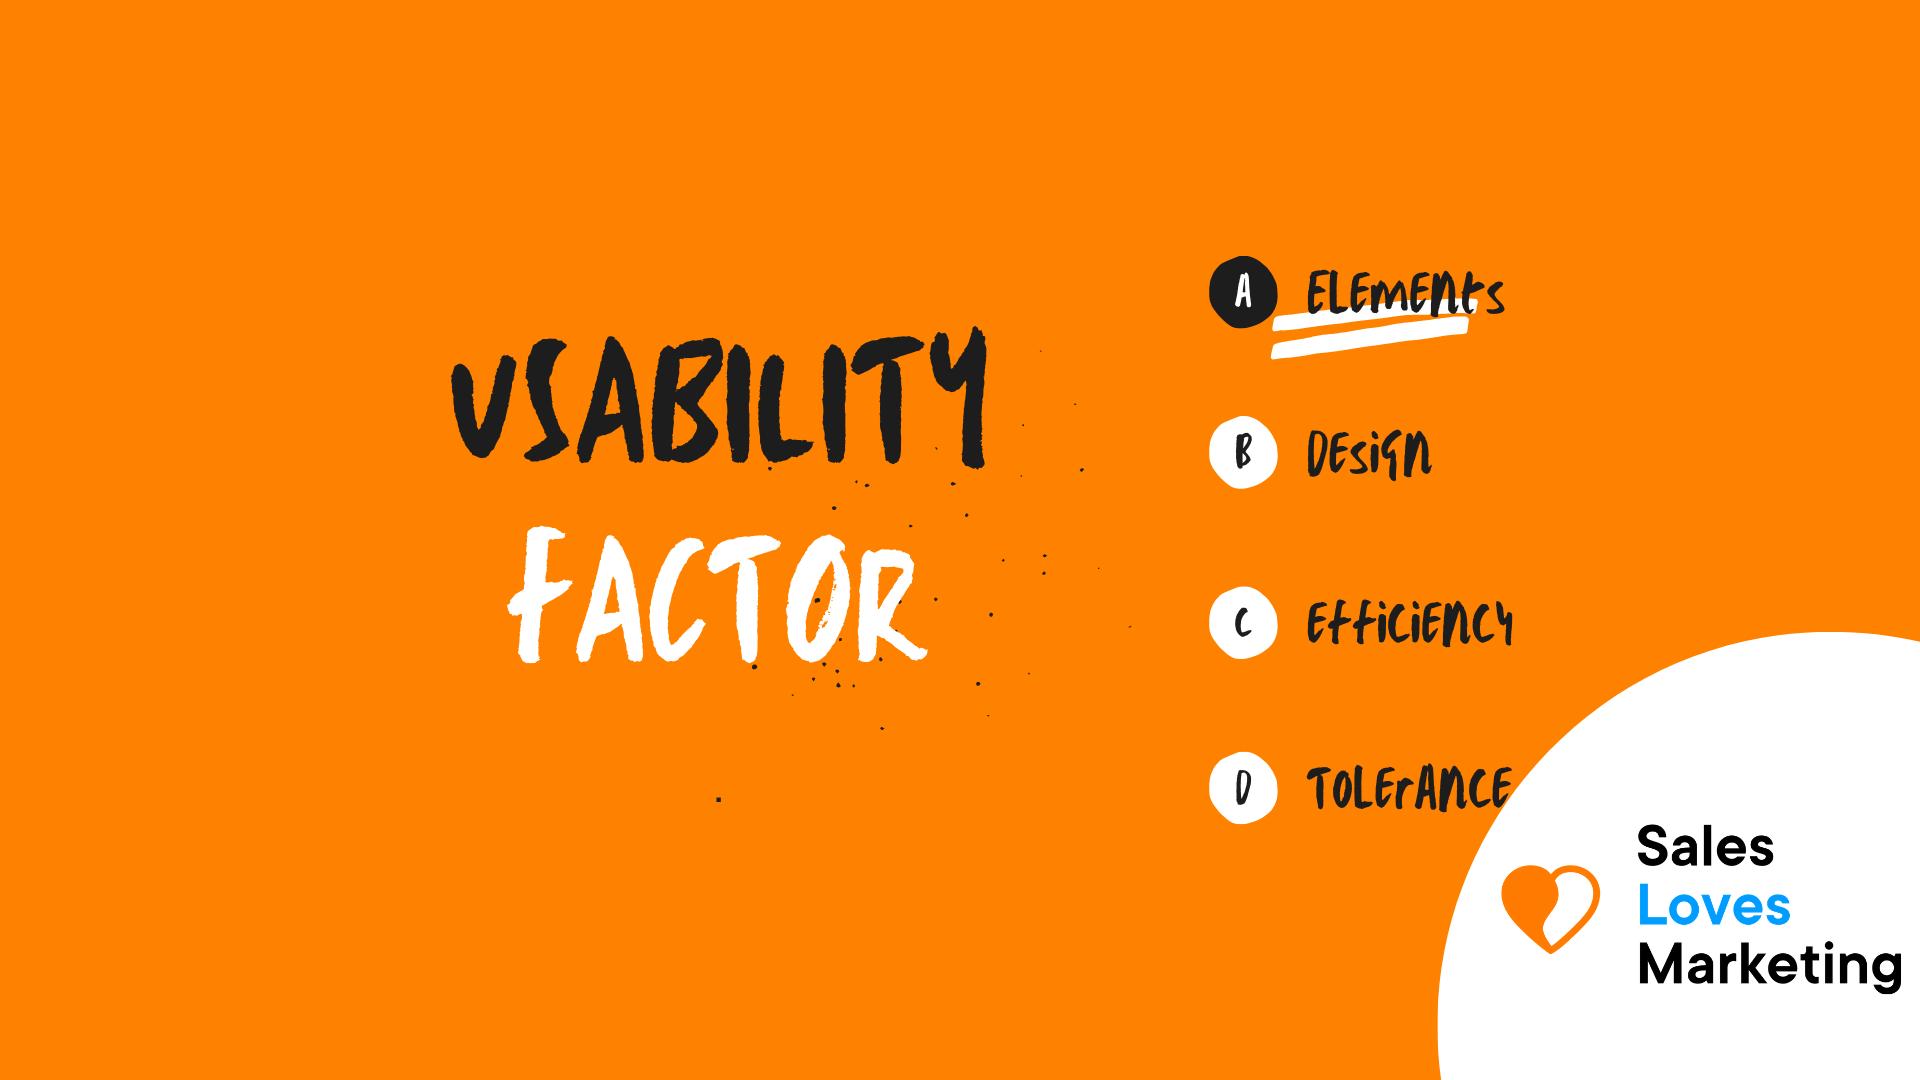 Usability Factor